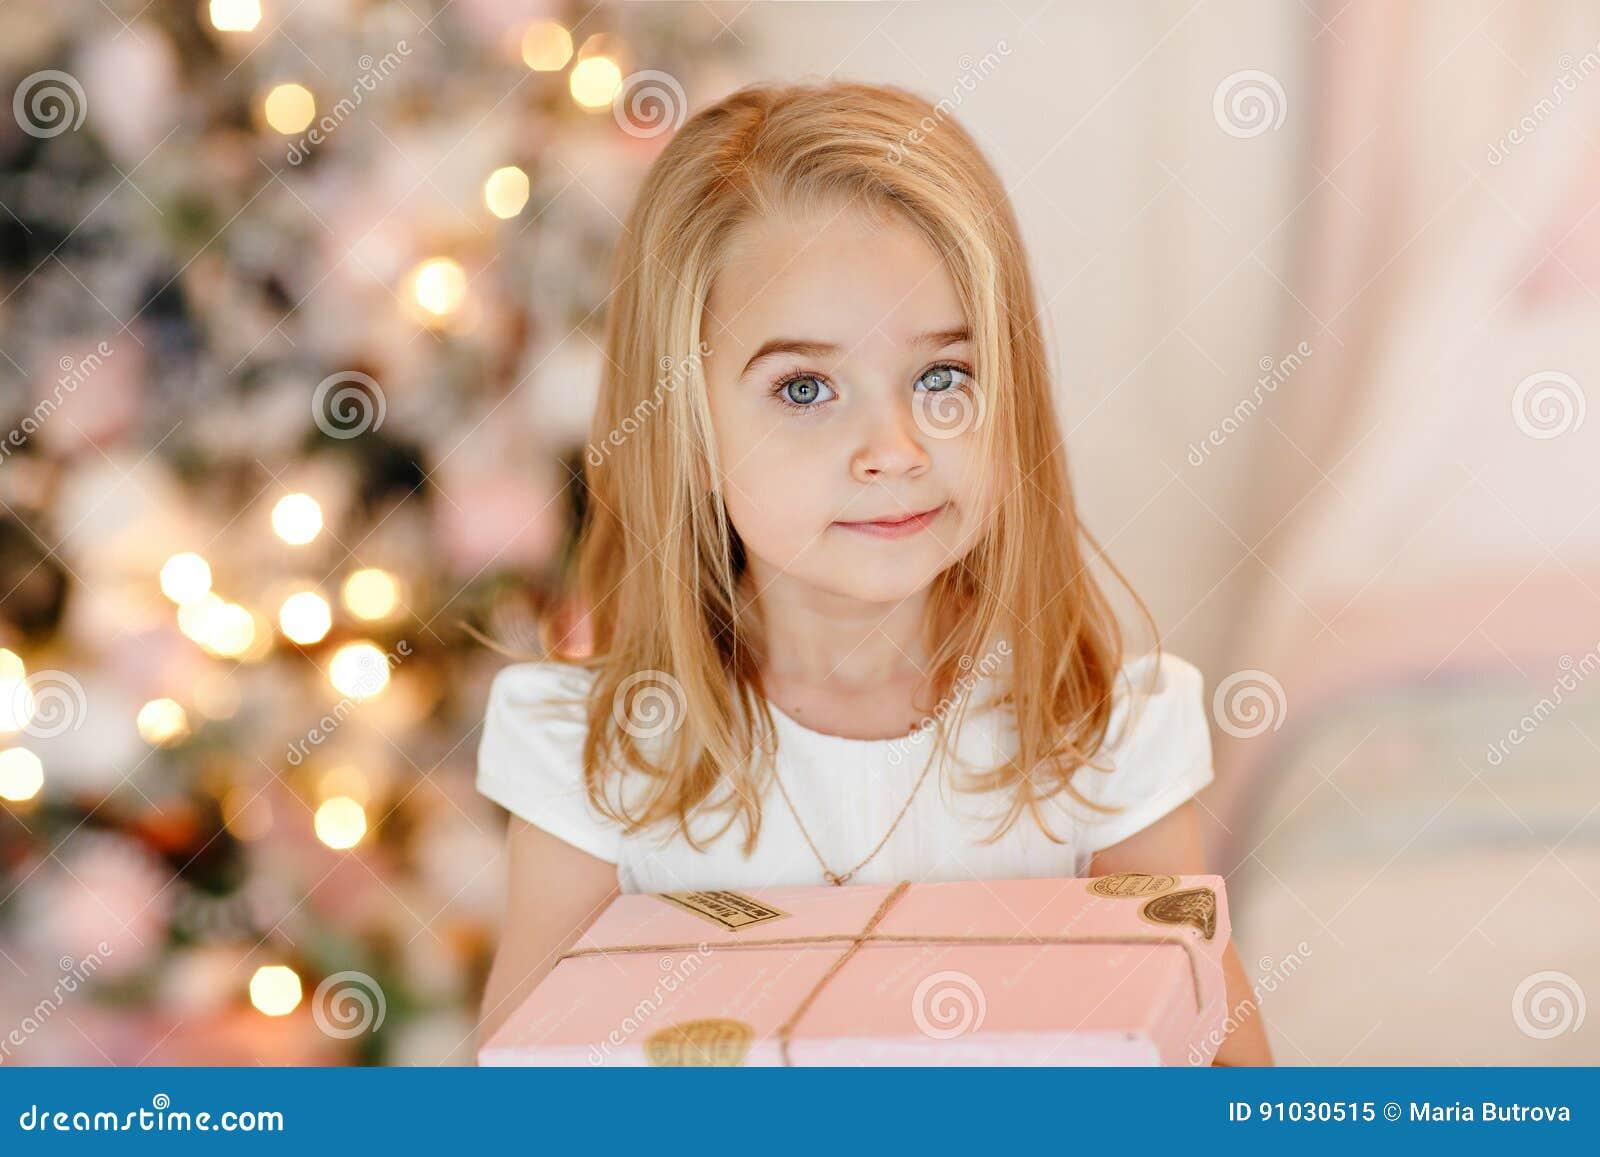 little girl blonde pussy